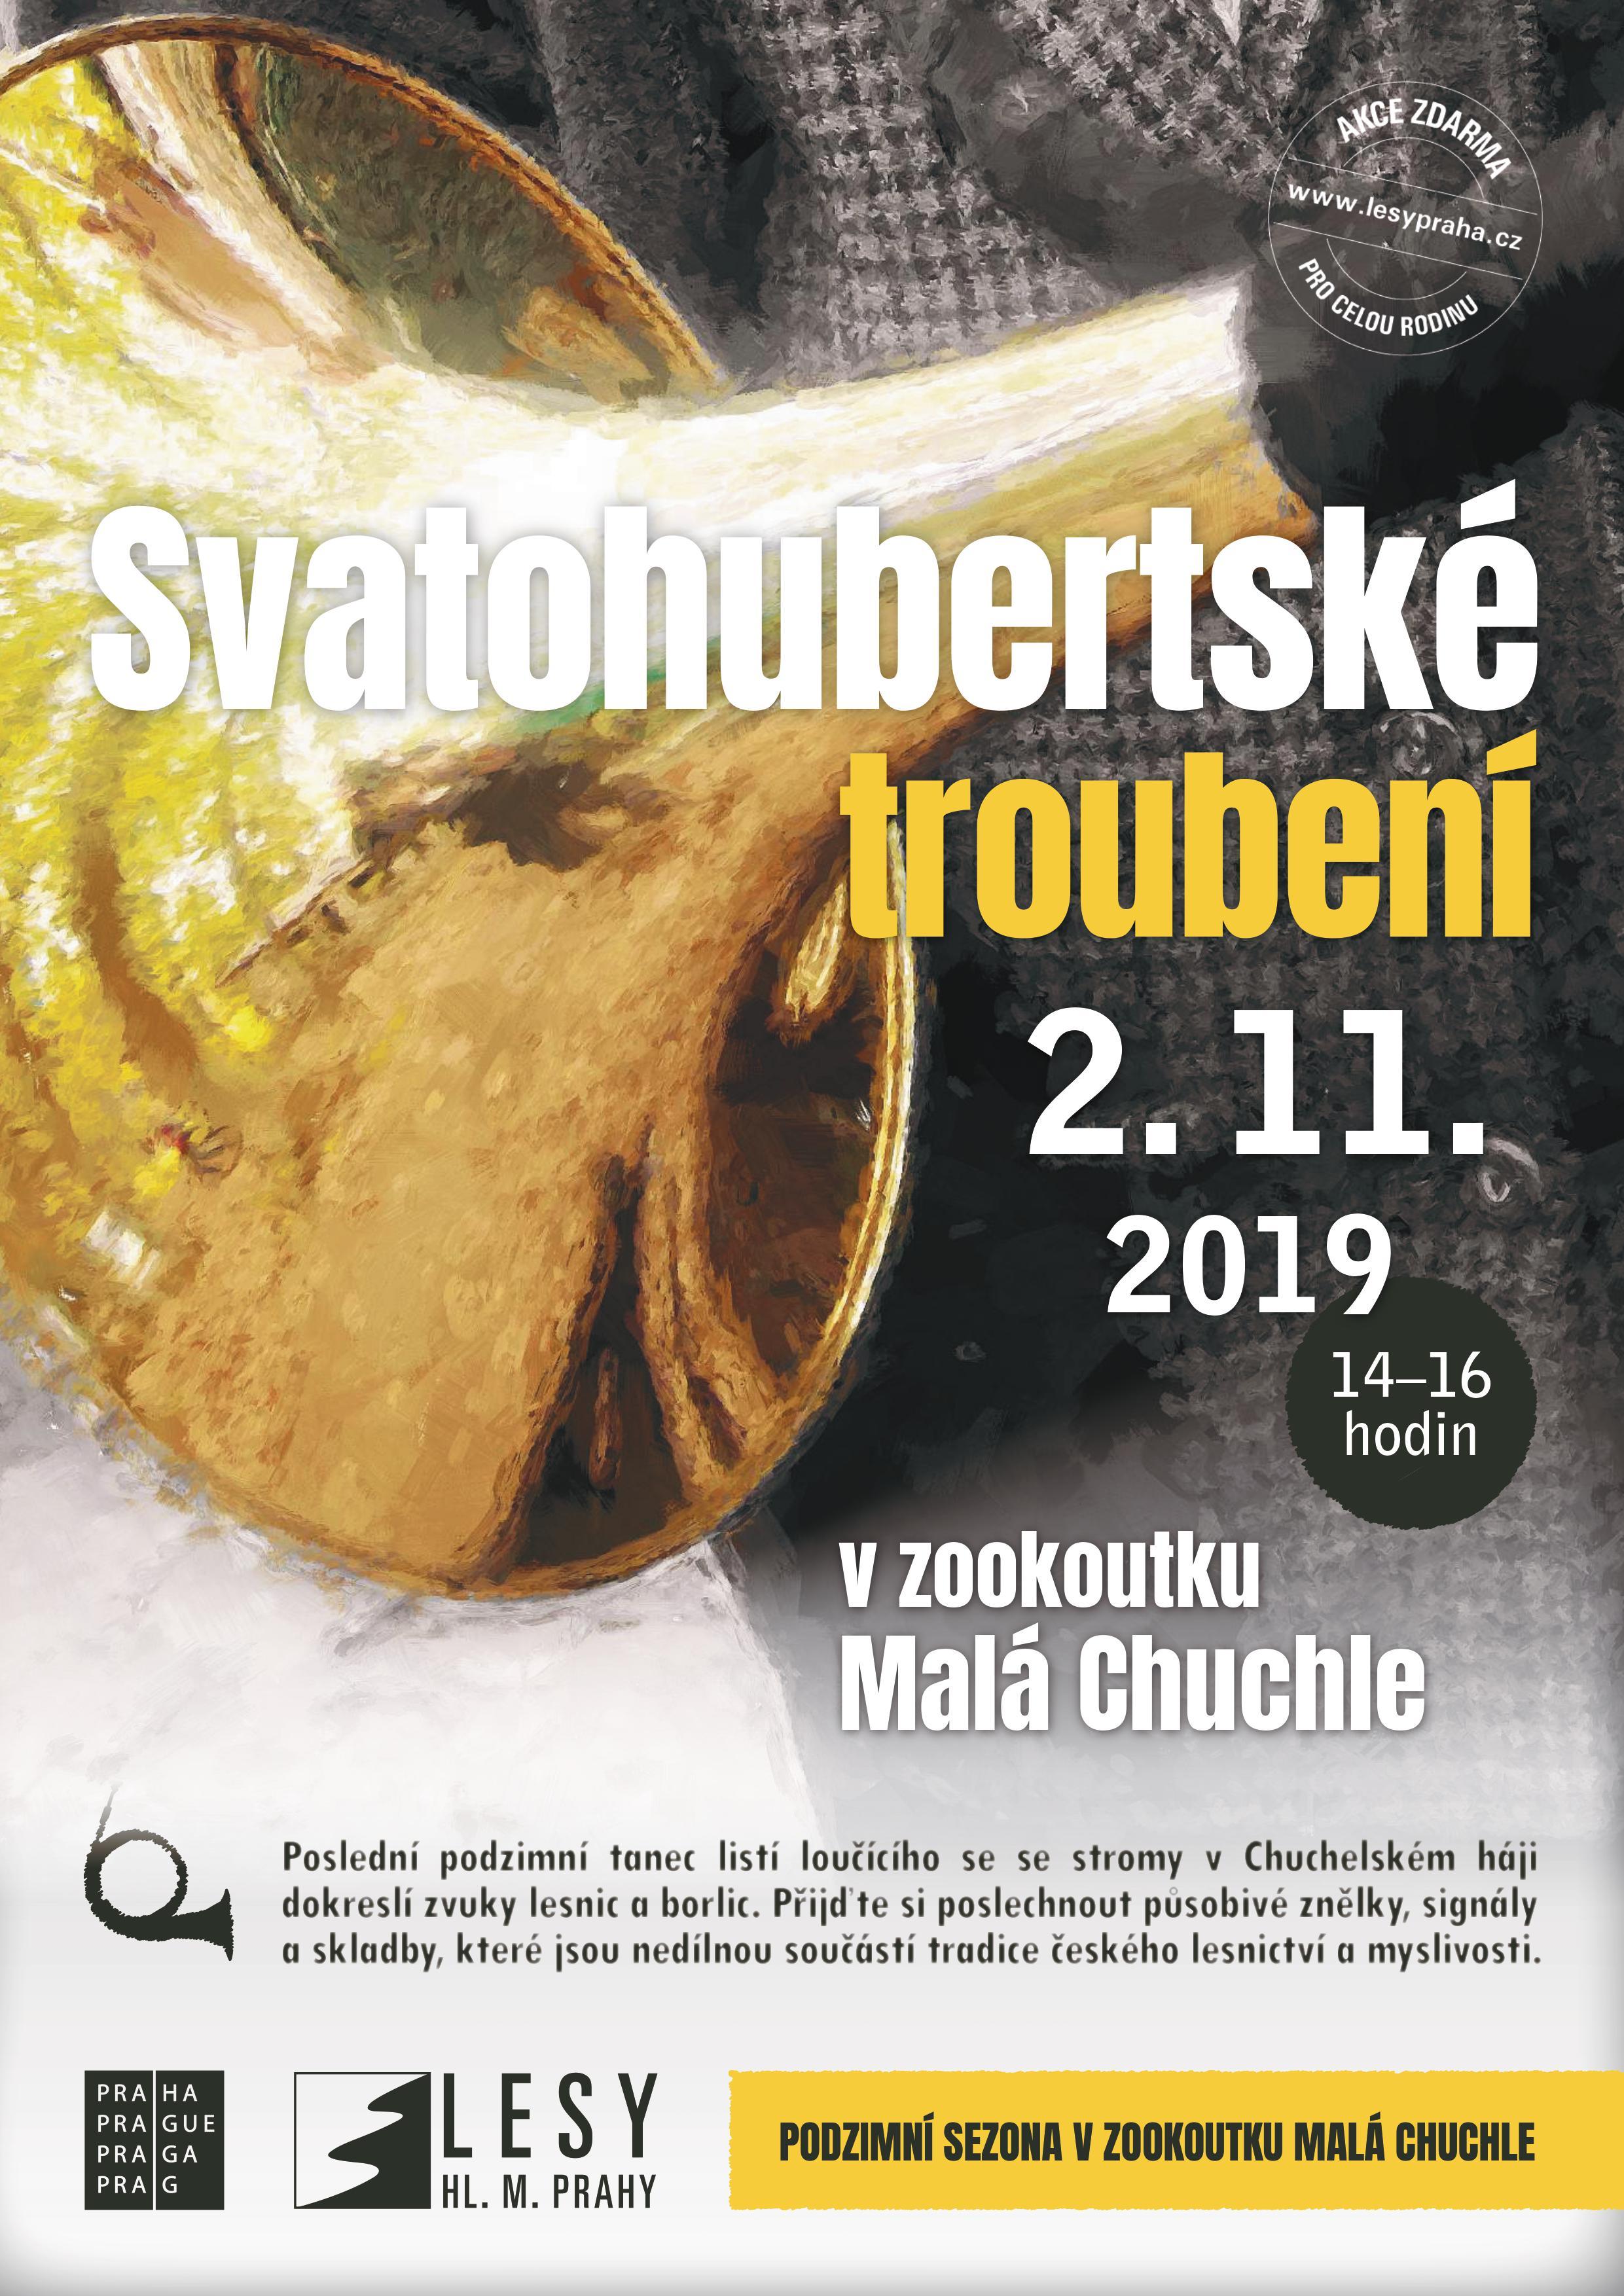 svatohubertske-troubeni-2017